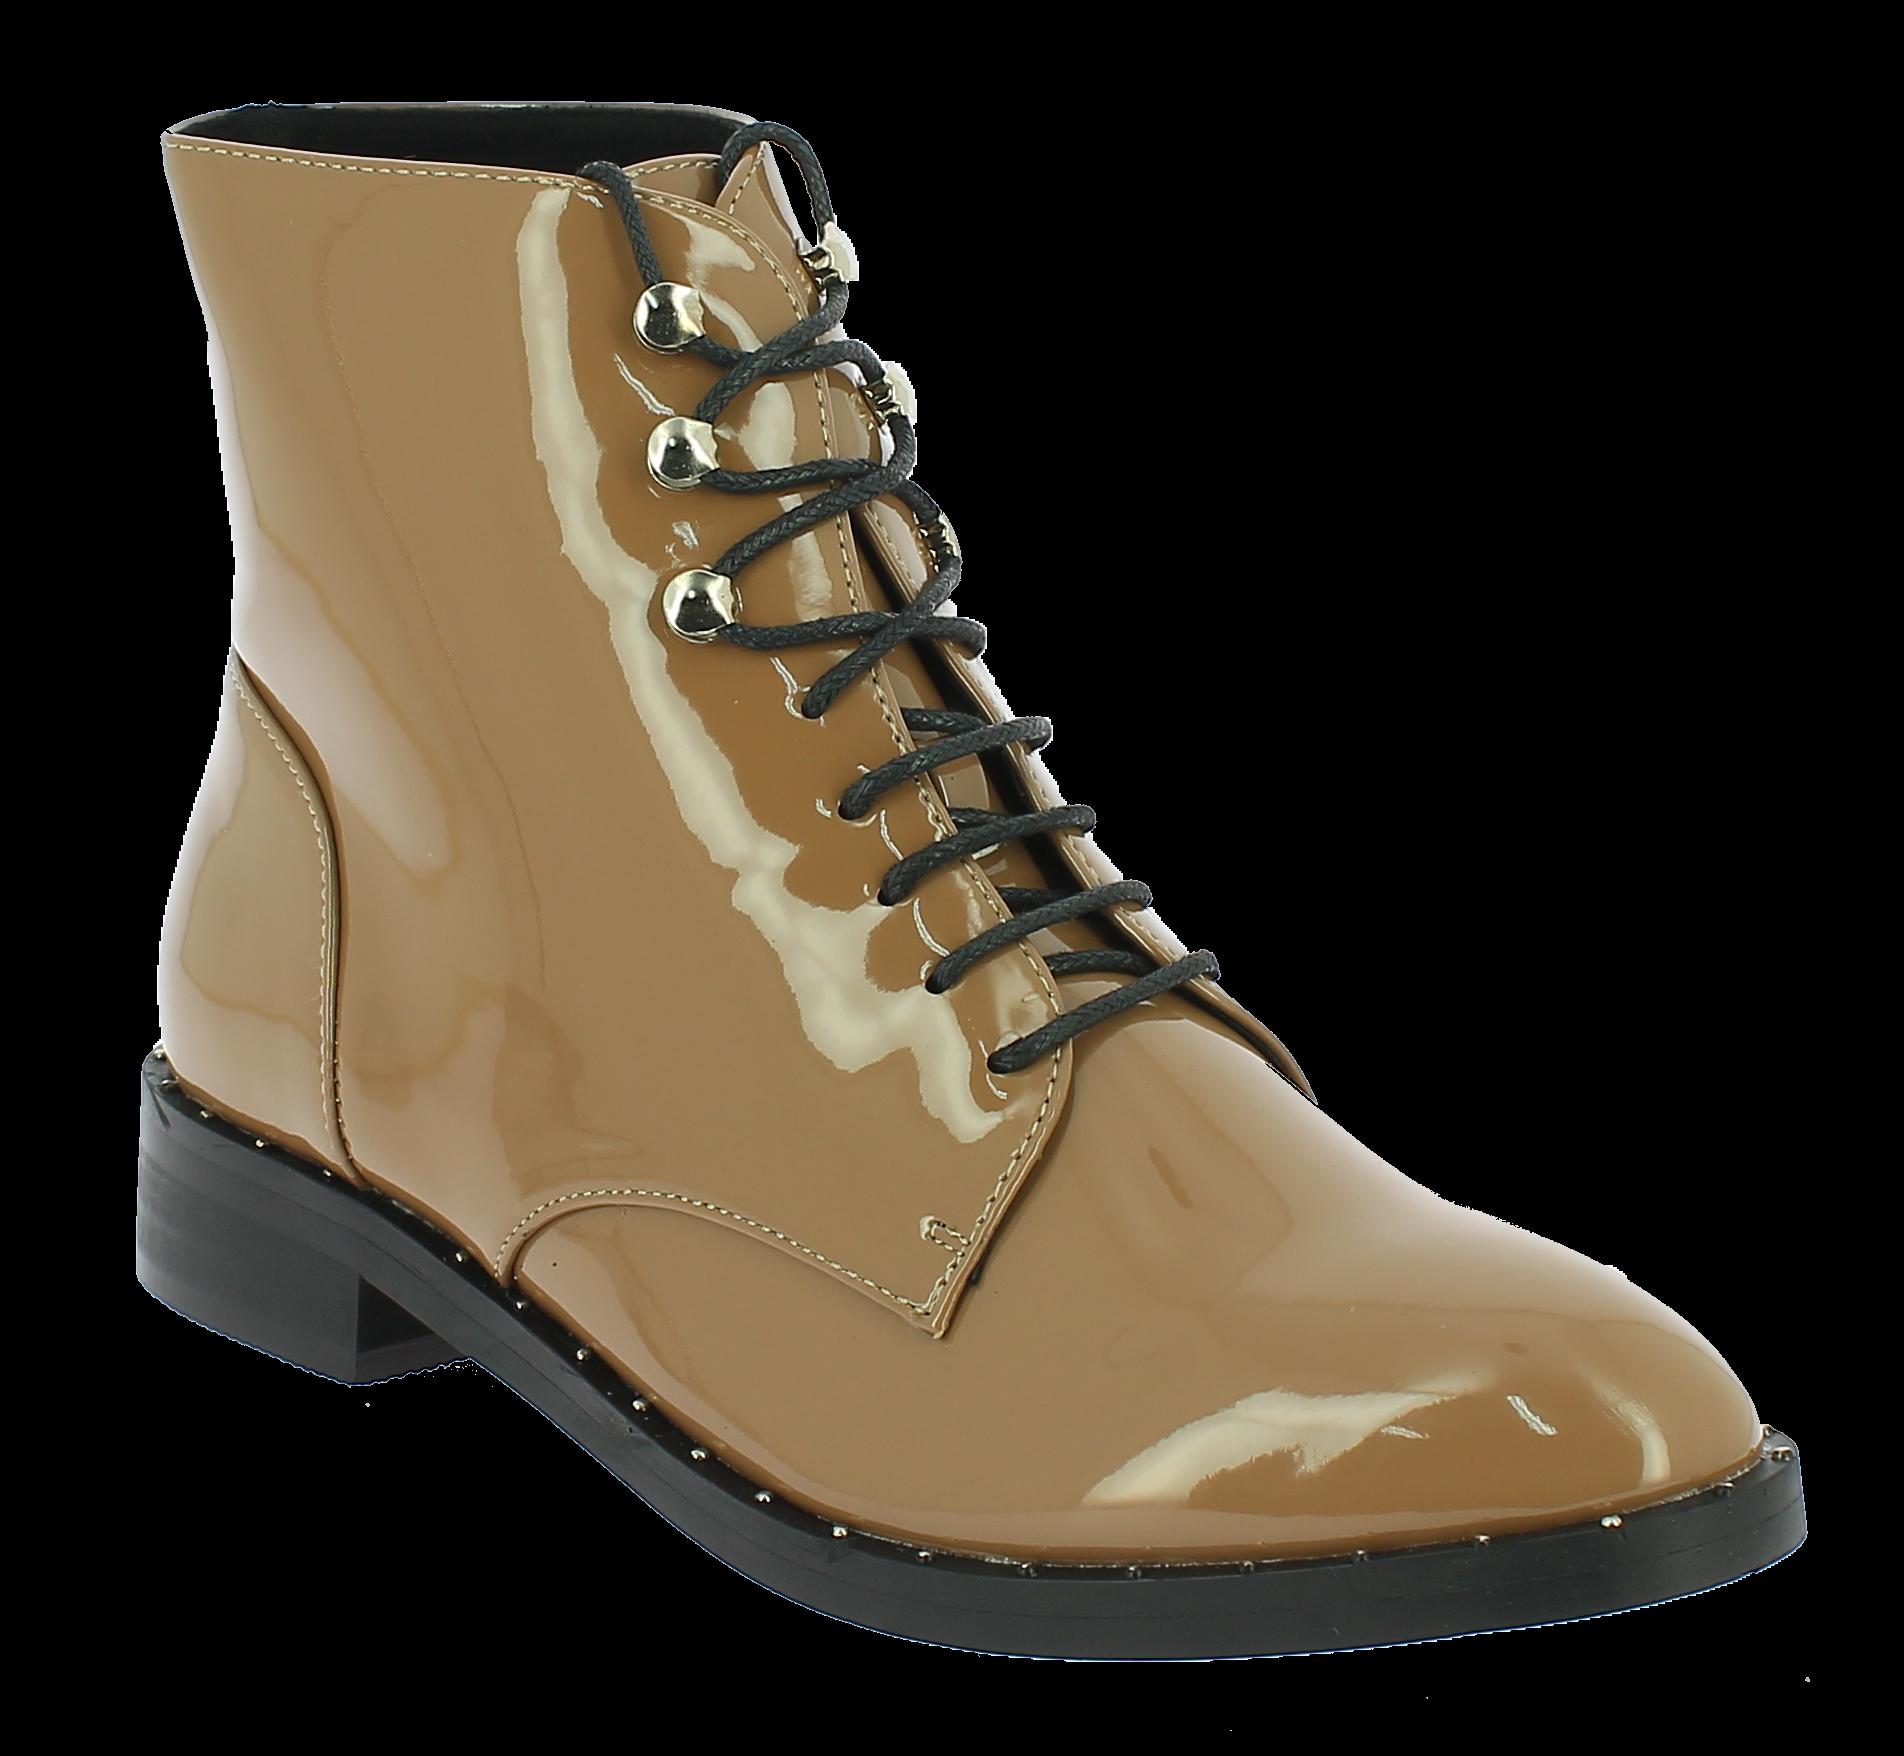 CORINA Γυναικείο Μποτάκι C7821 Μπέζ - IqShoes - C7821 PIEDRA-beige-37/1/7/27 παπούτσια  new in